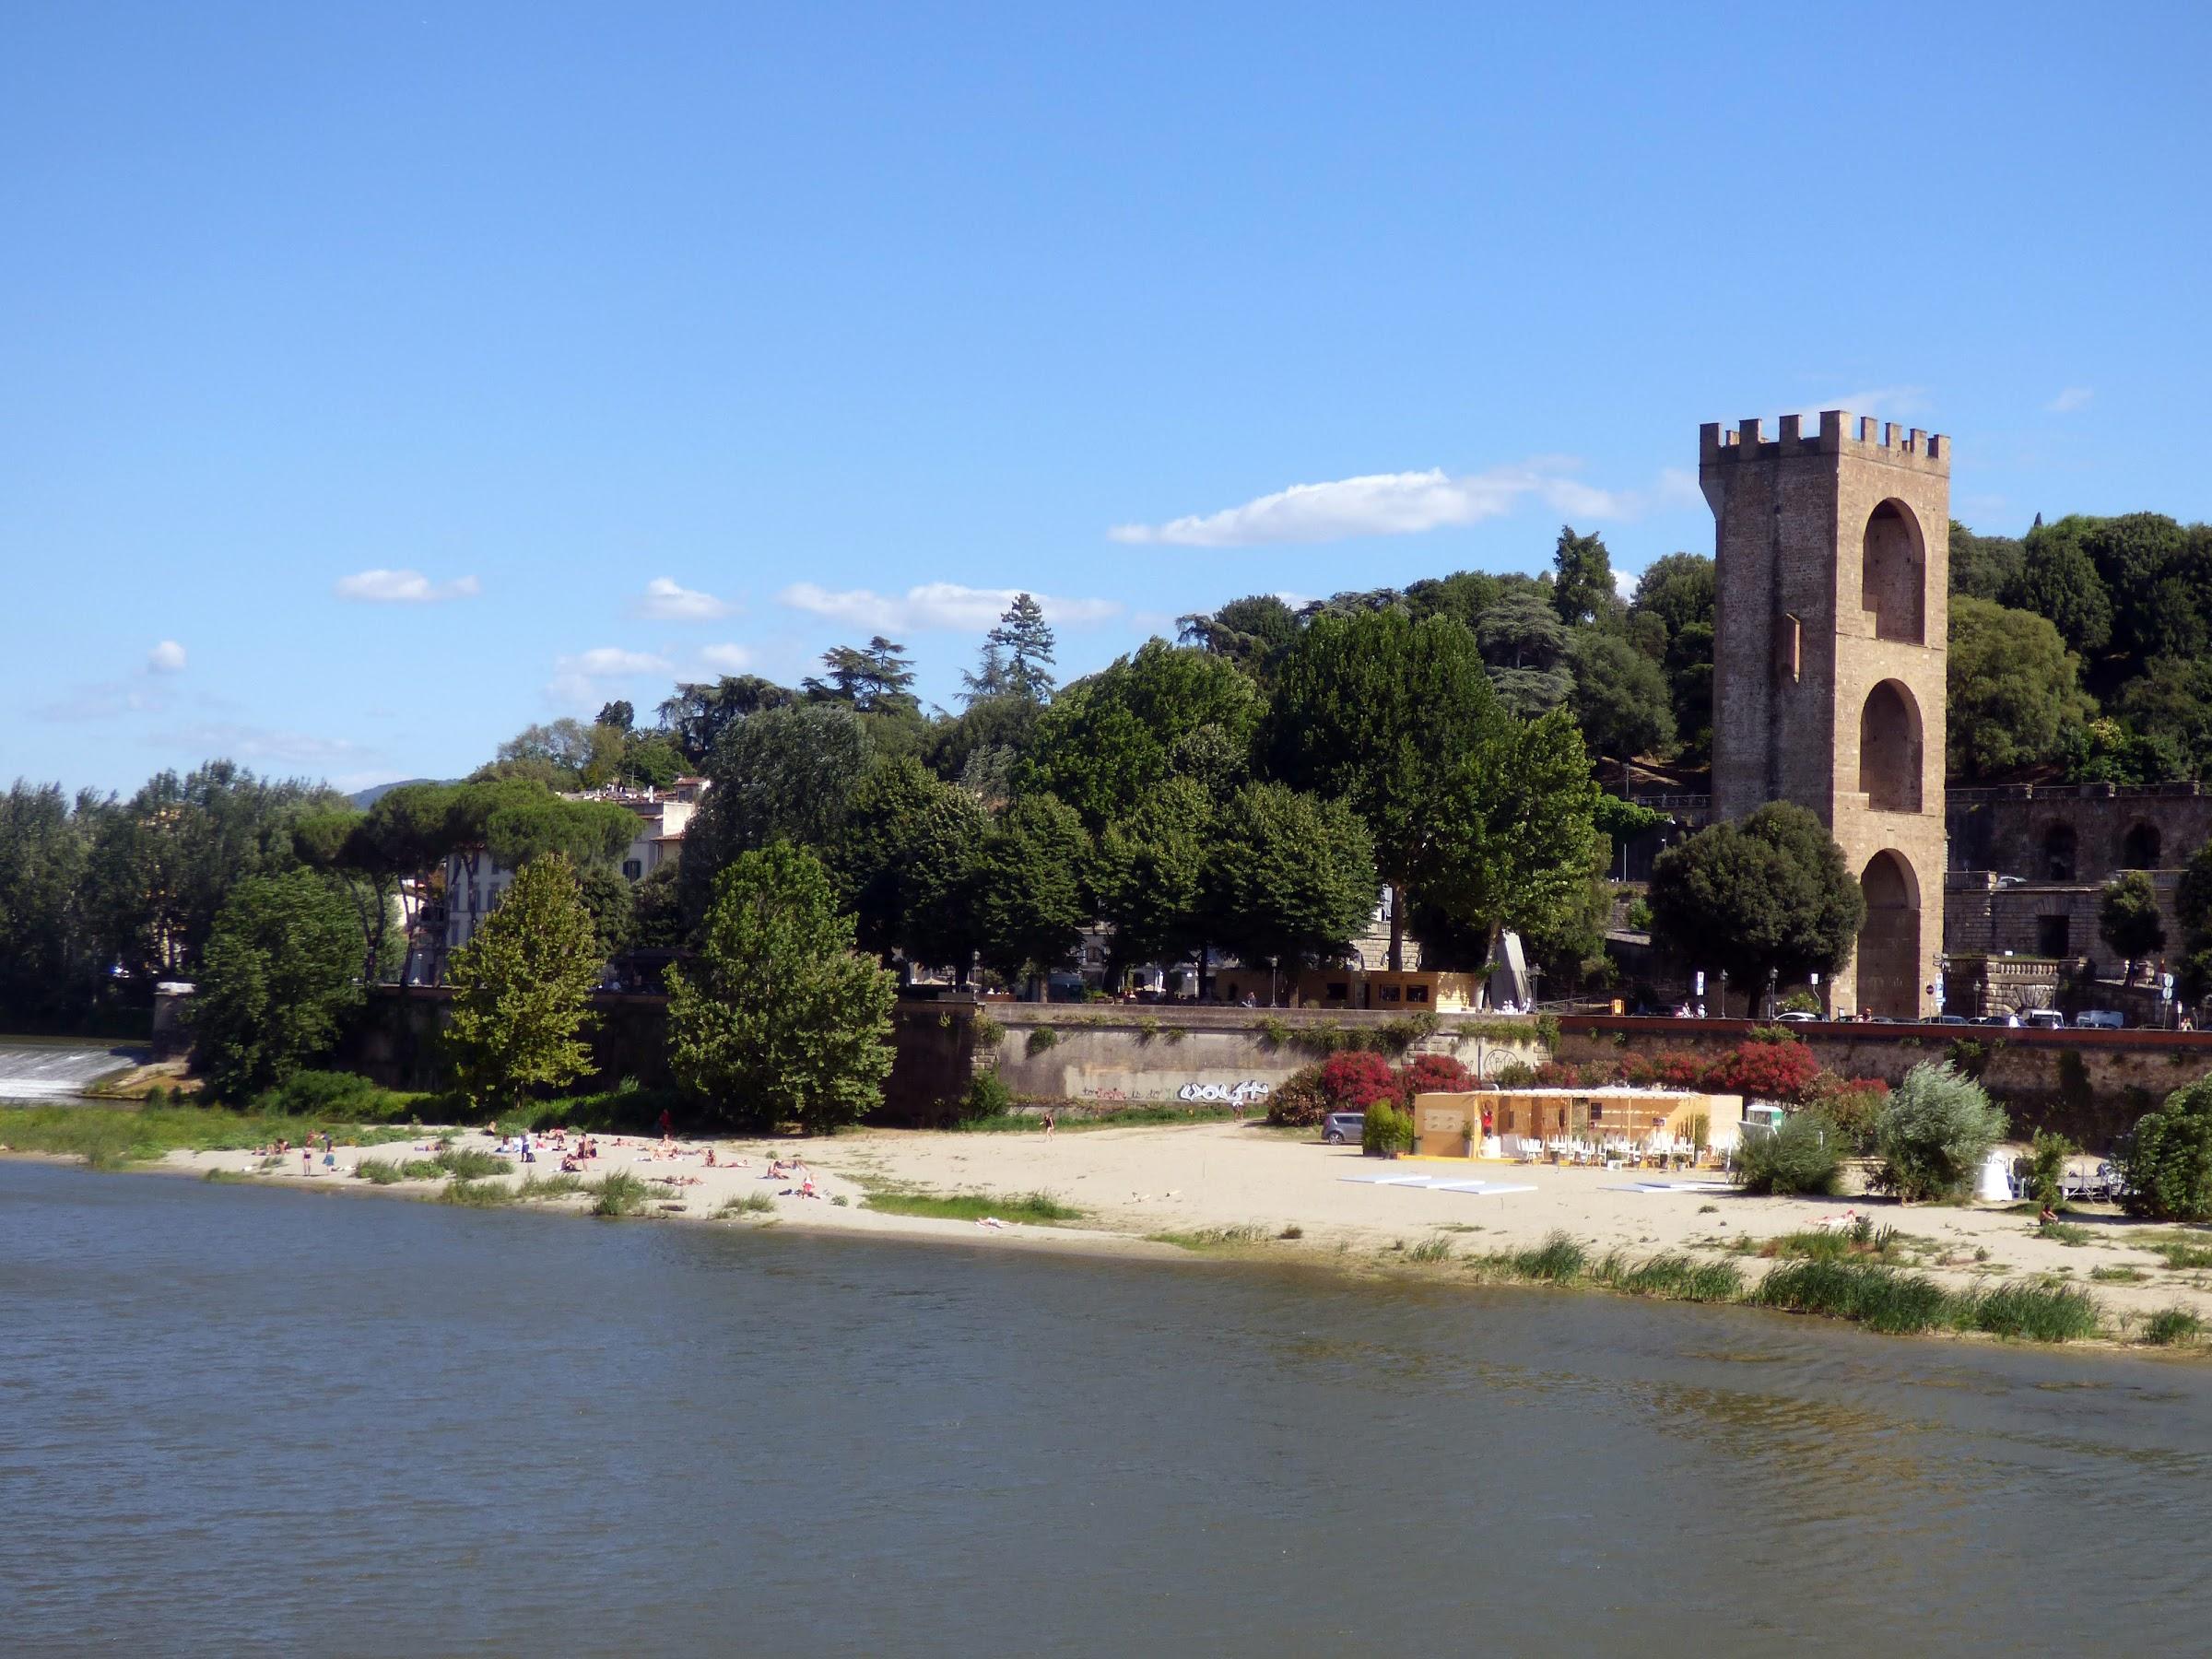 La spiaggia sull'Arno en de toren van San Niccolò